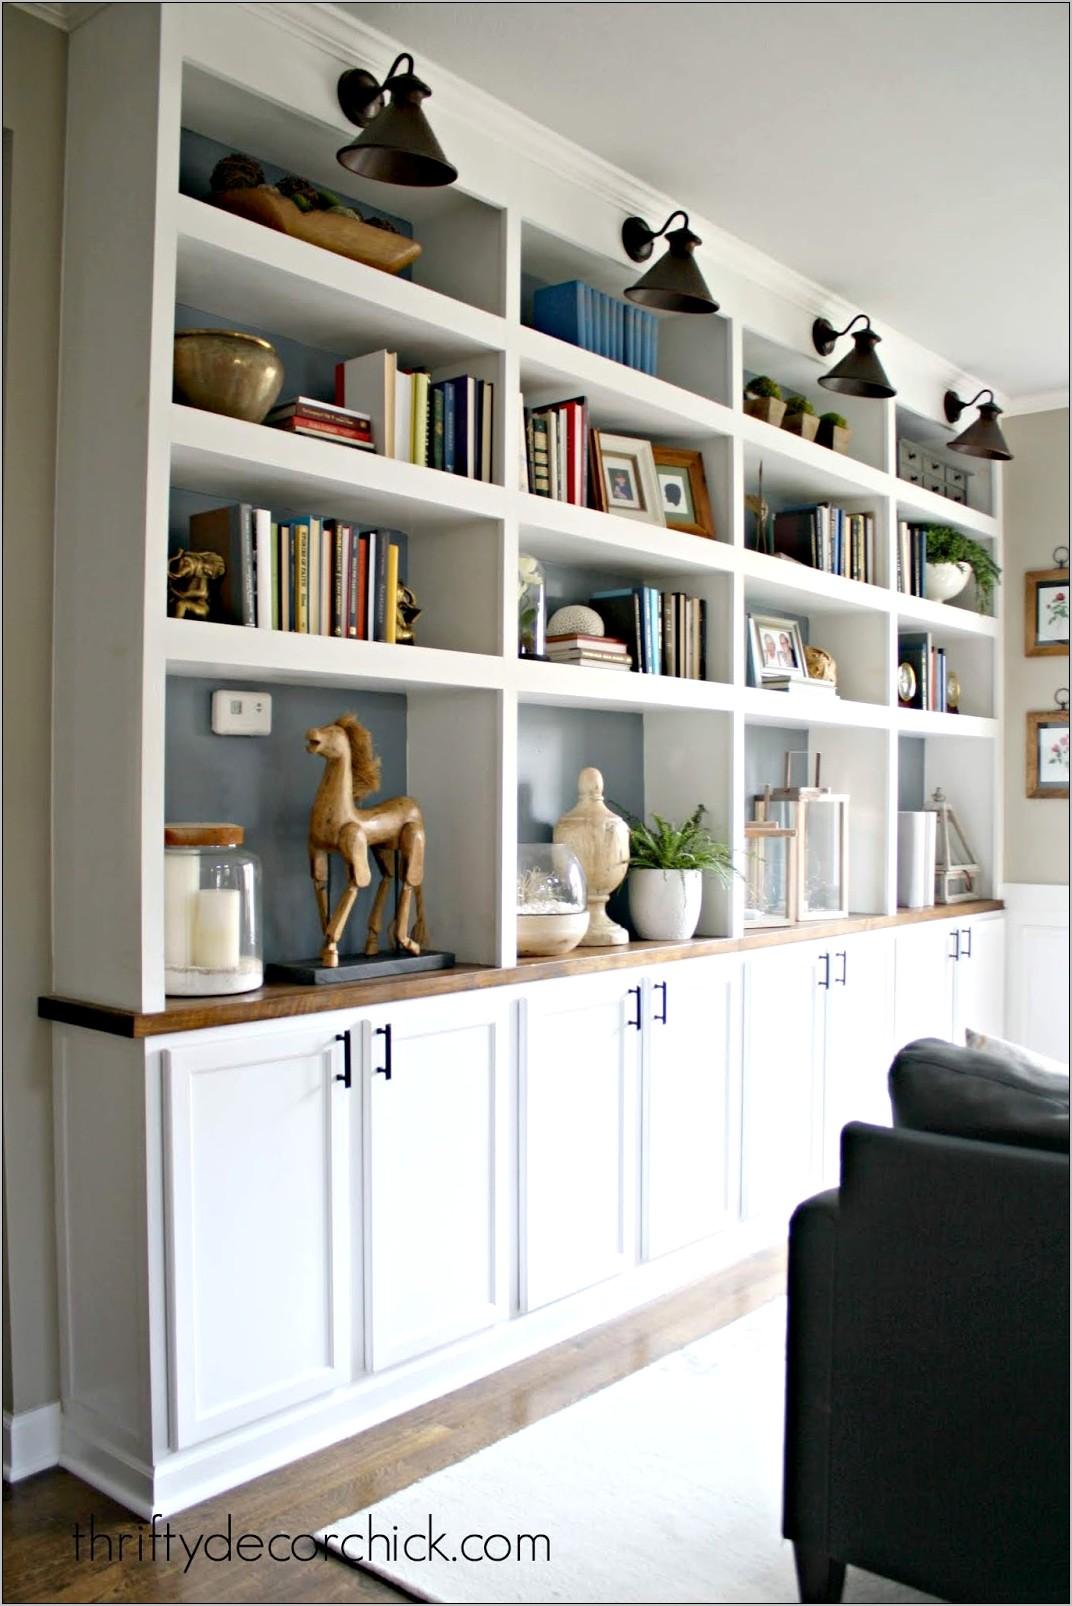 Decorating Black Shelfs In Kitchen Cabinets